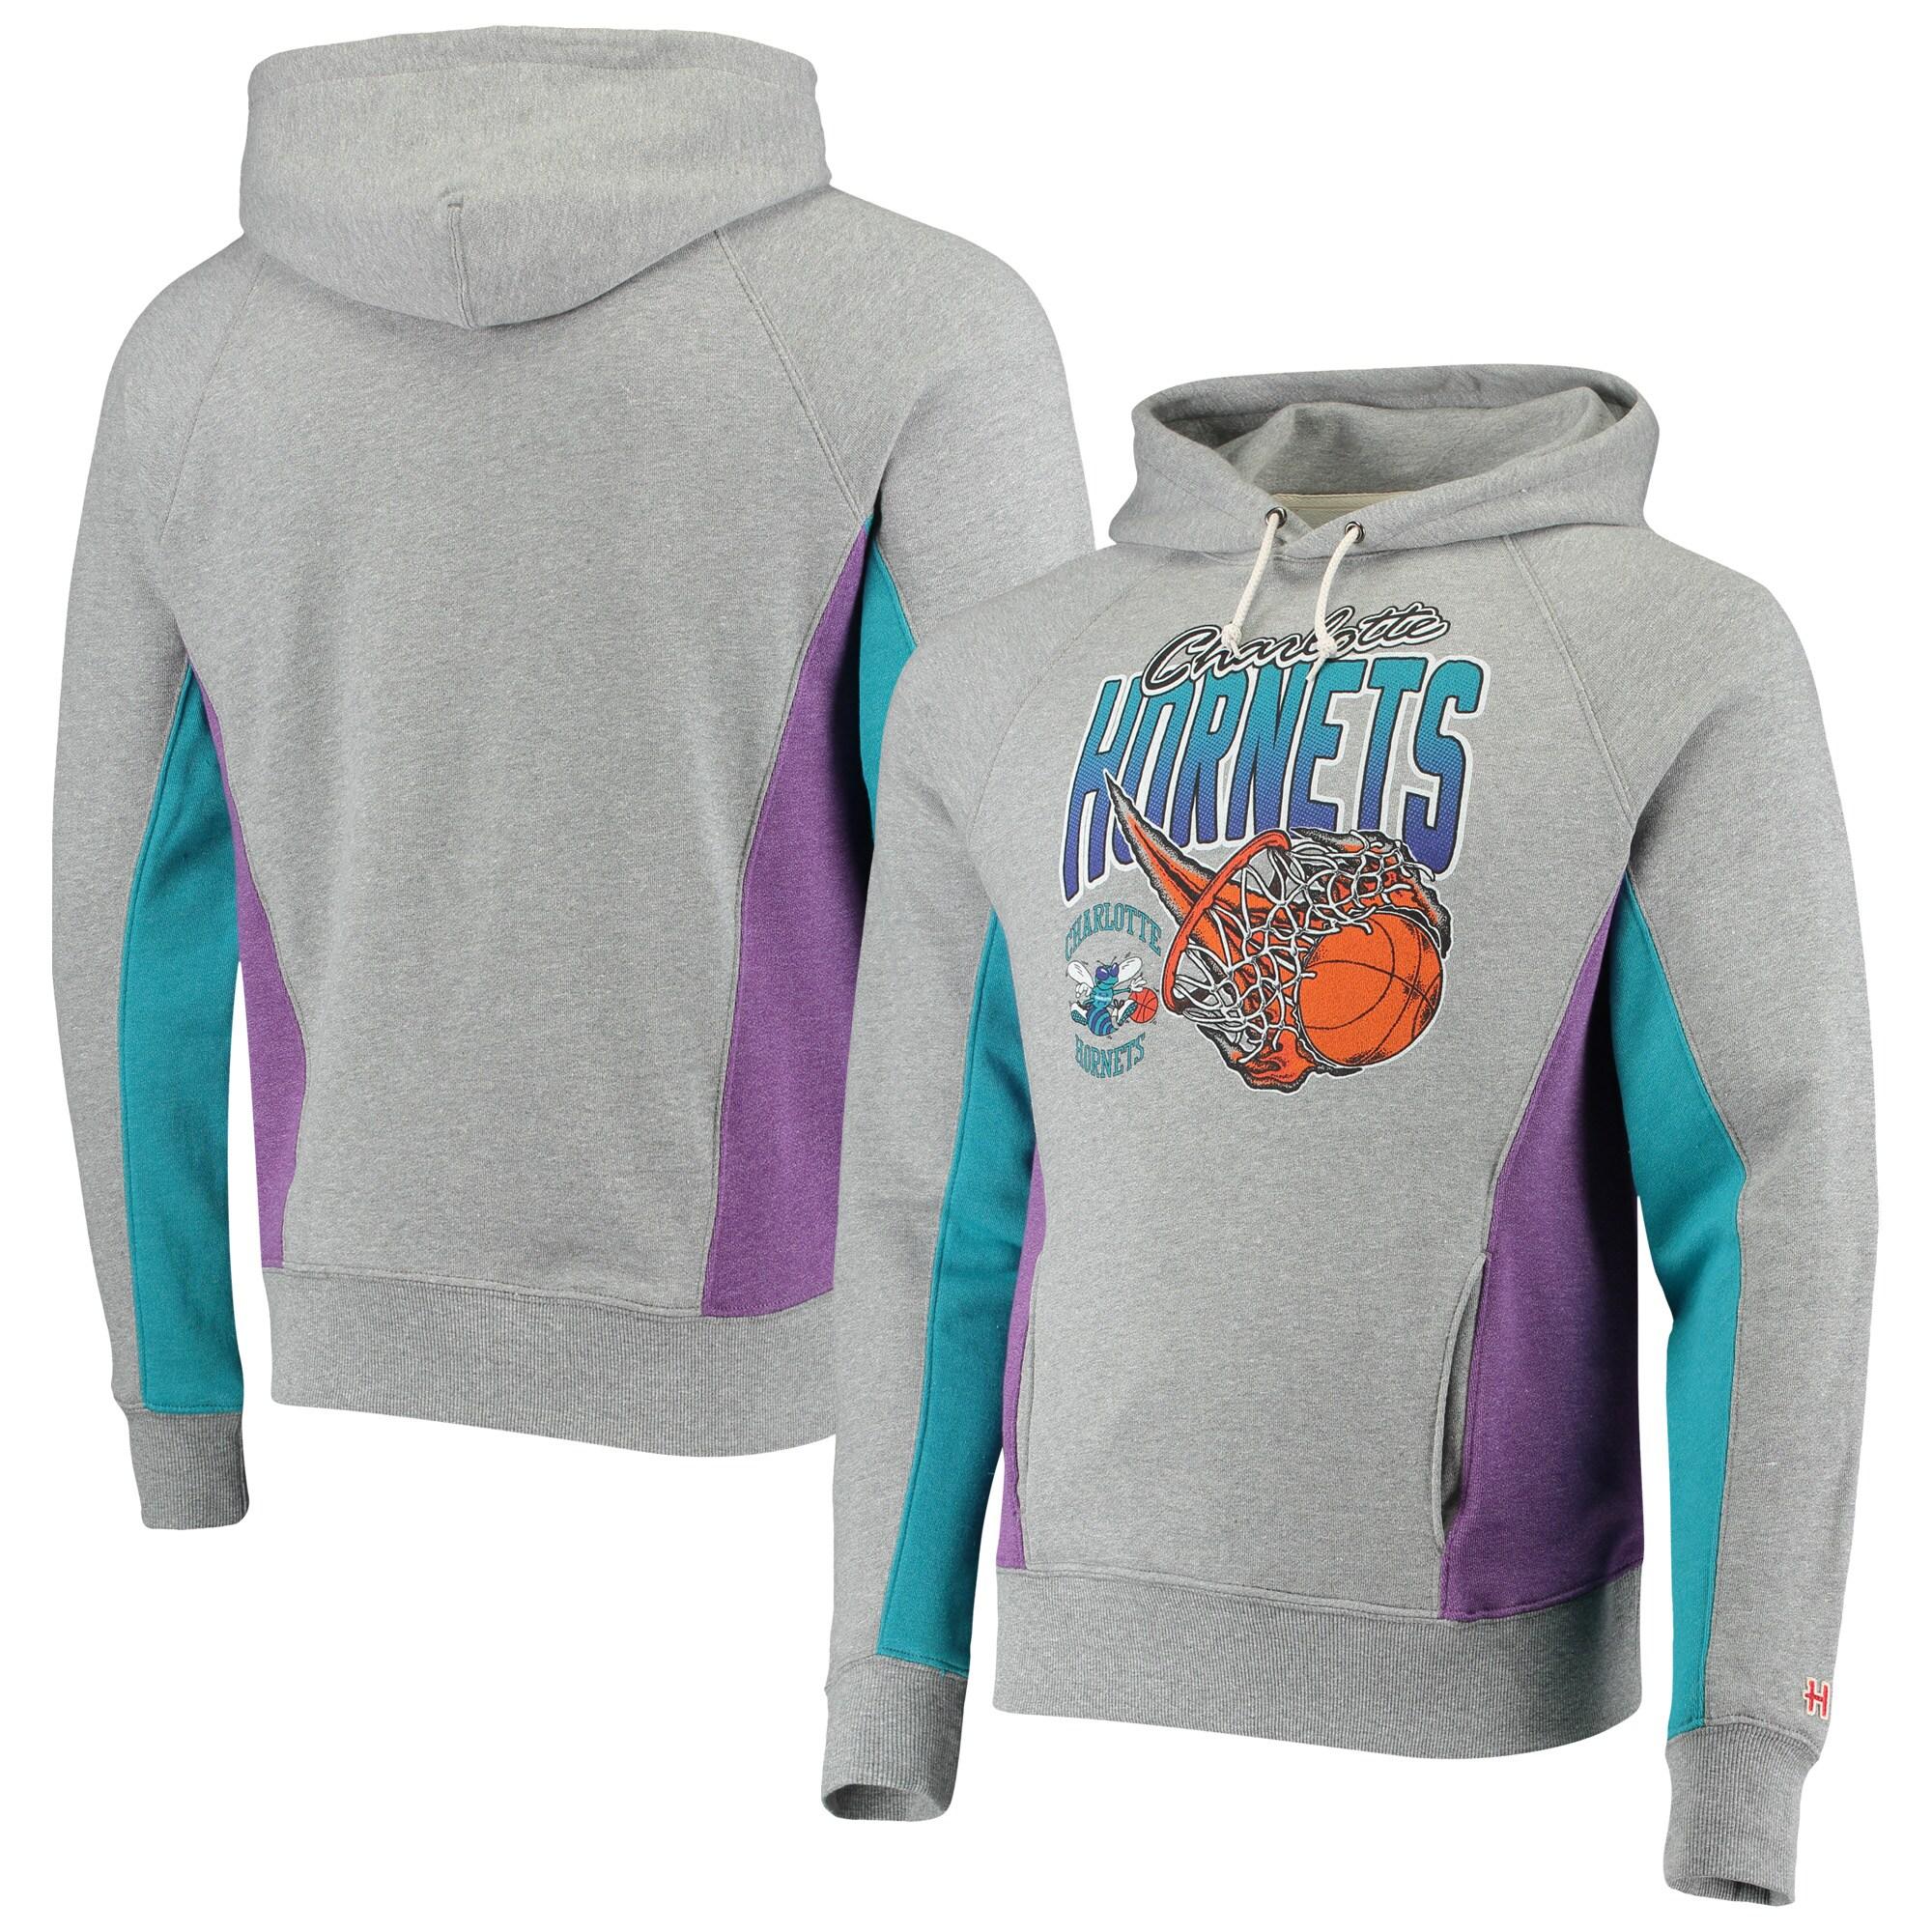 Charlotte Hornets Homage On Fire Raglan Tri-Blend Pullover Hoodie - Gray